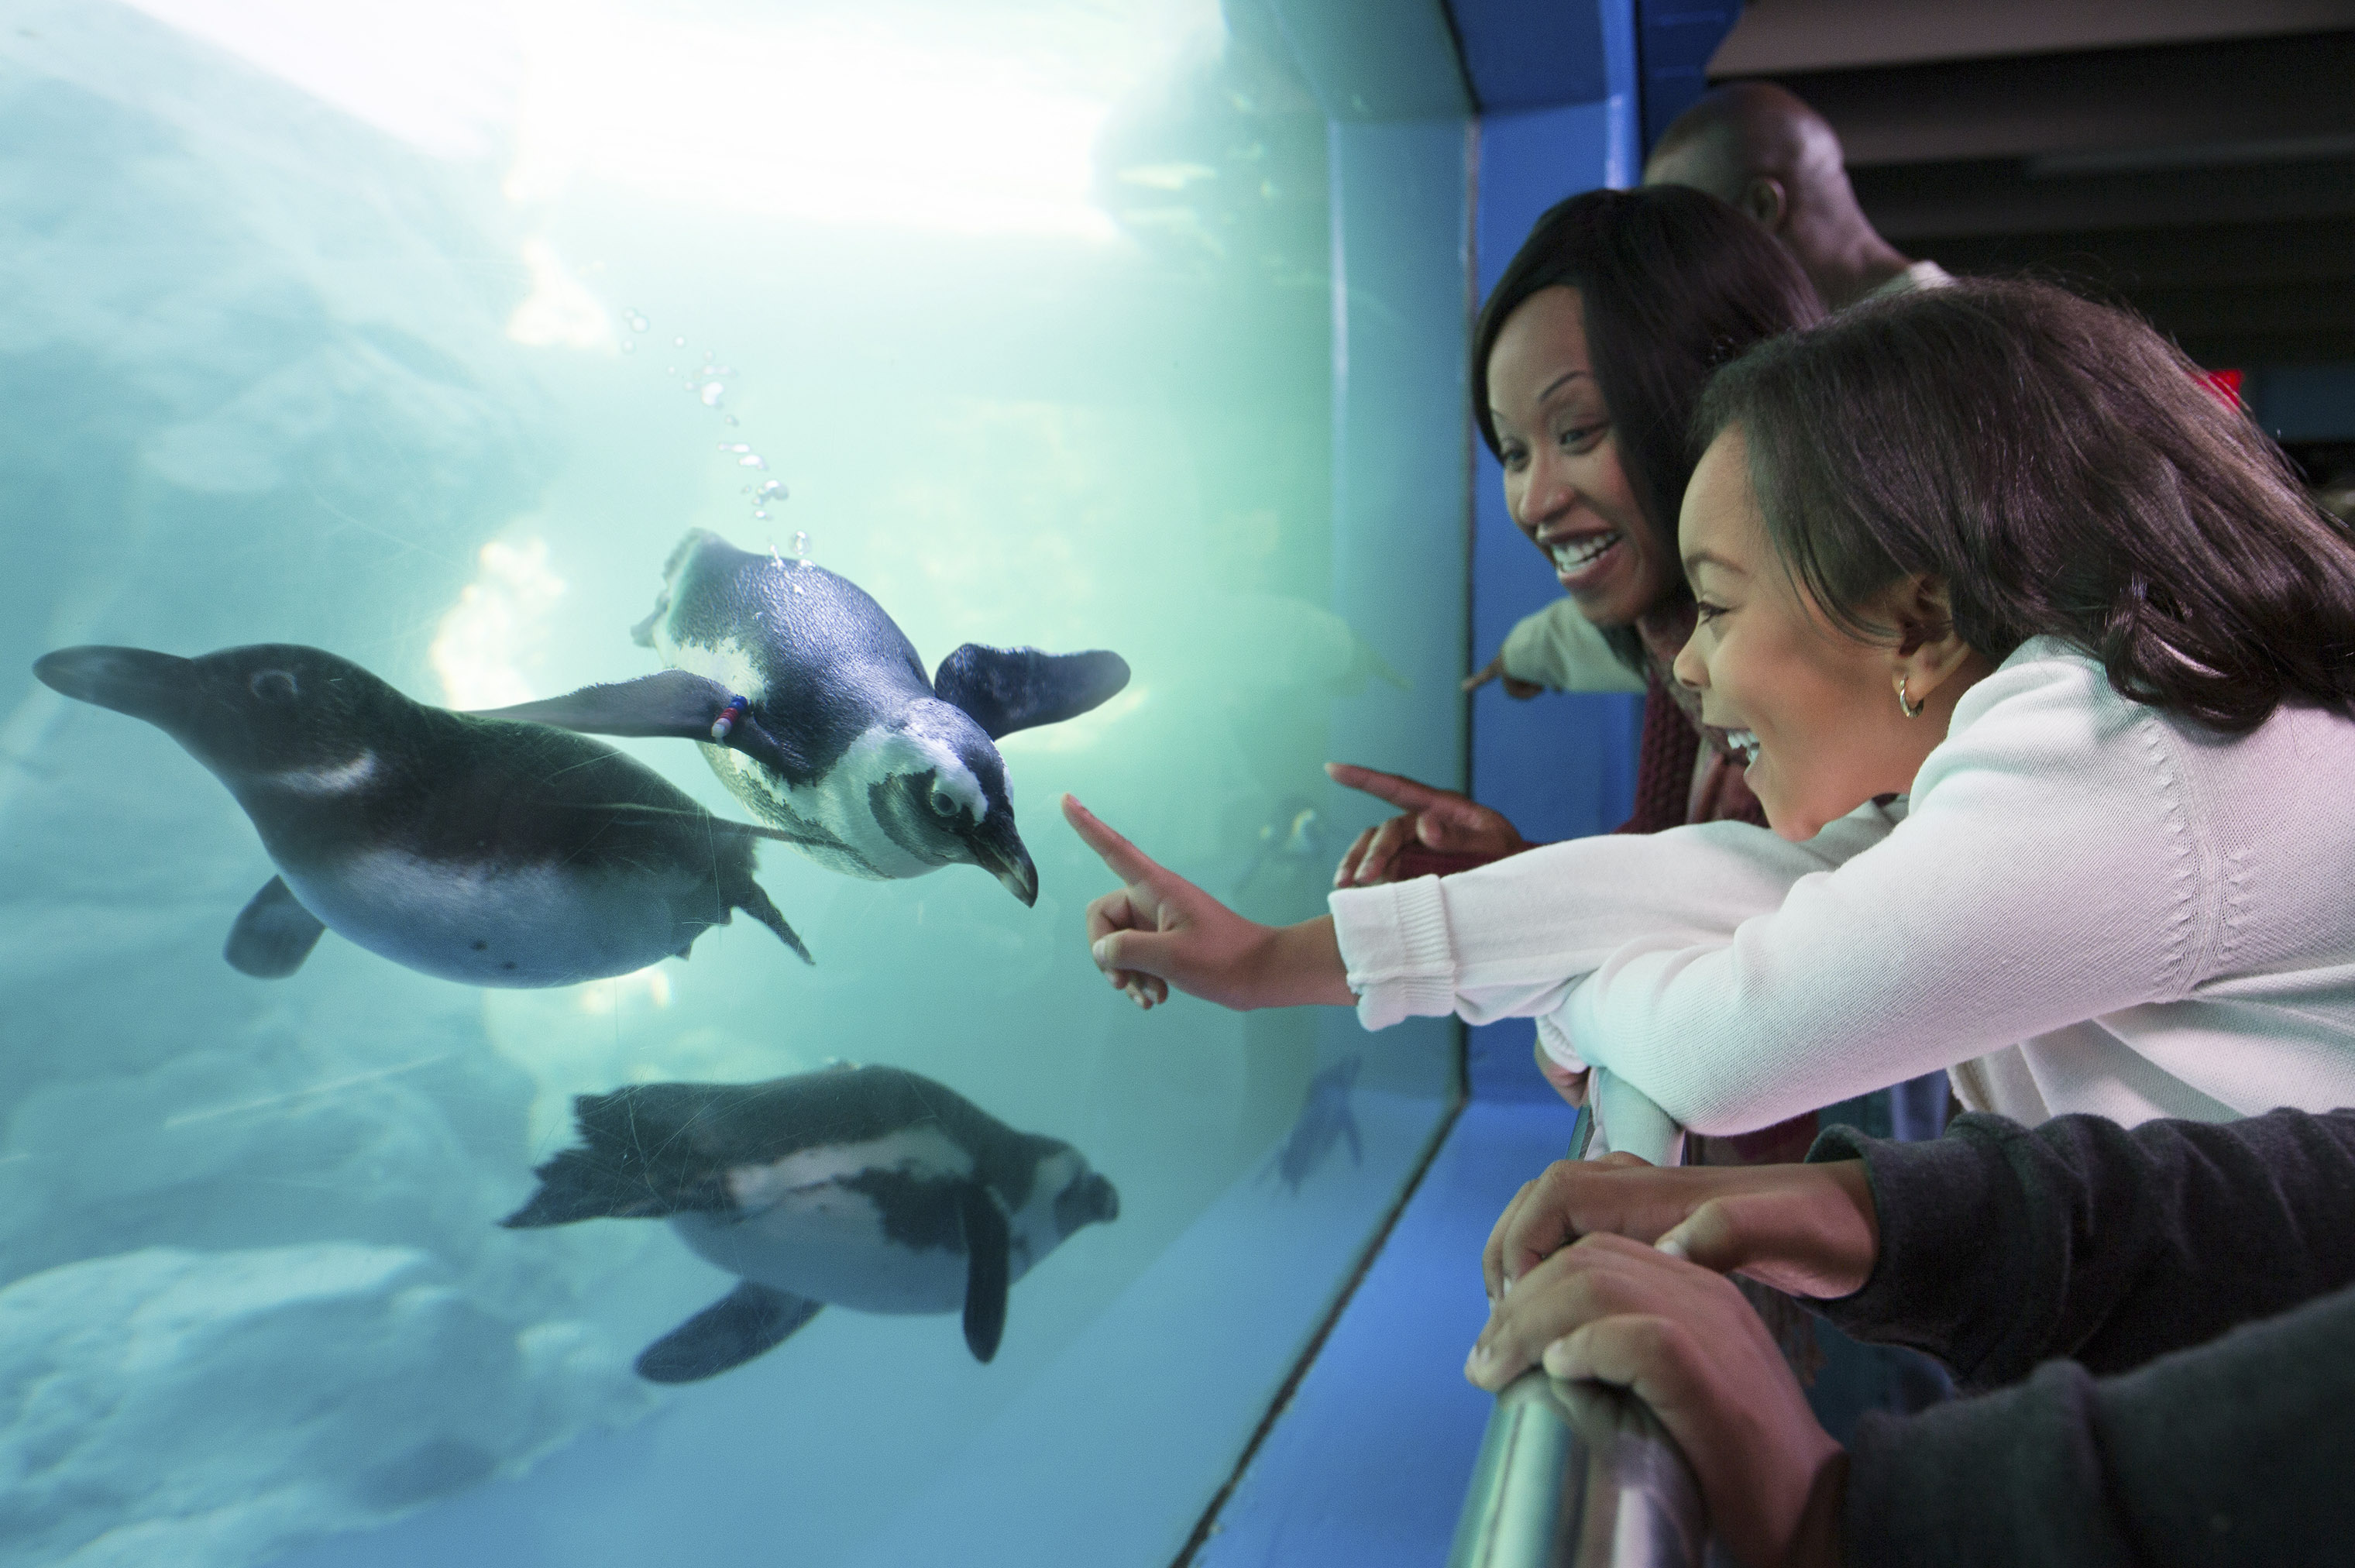 Visitors can meet wildlife up close at the national- award-winning Mystic Aquarium.